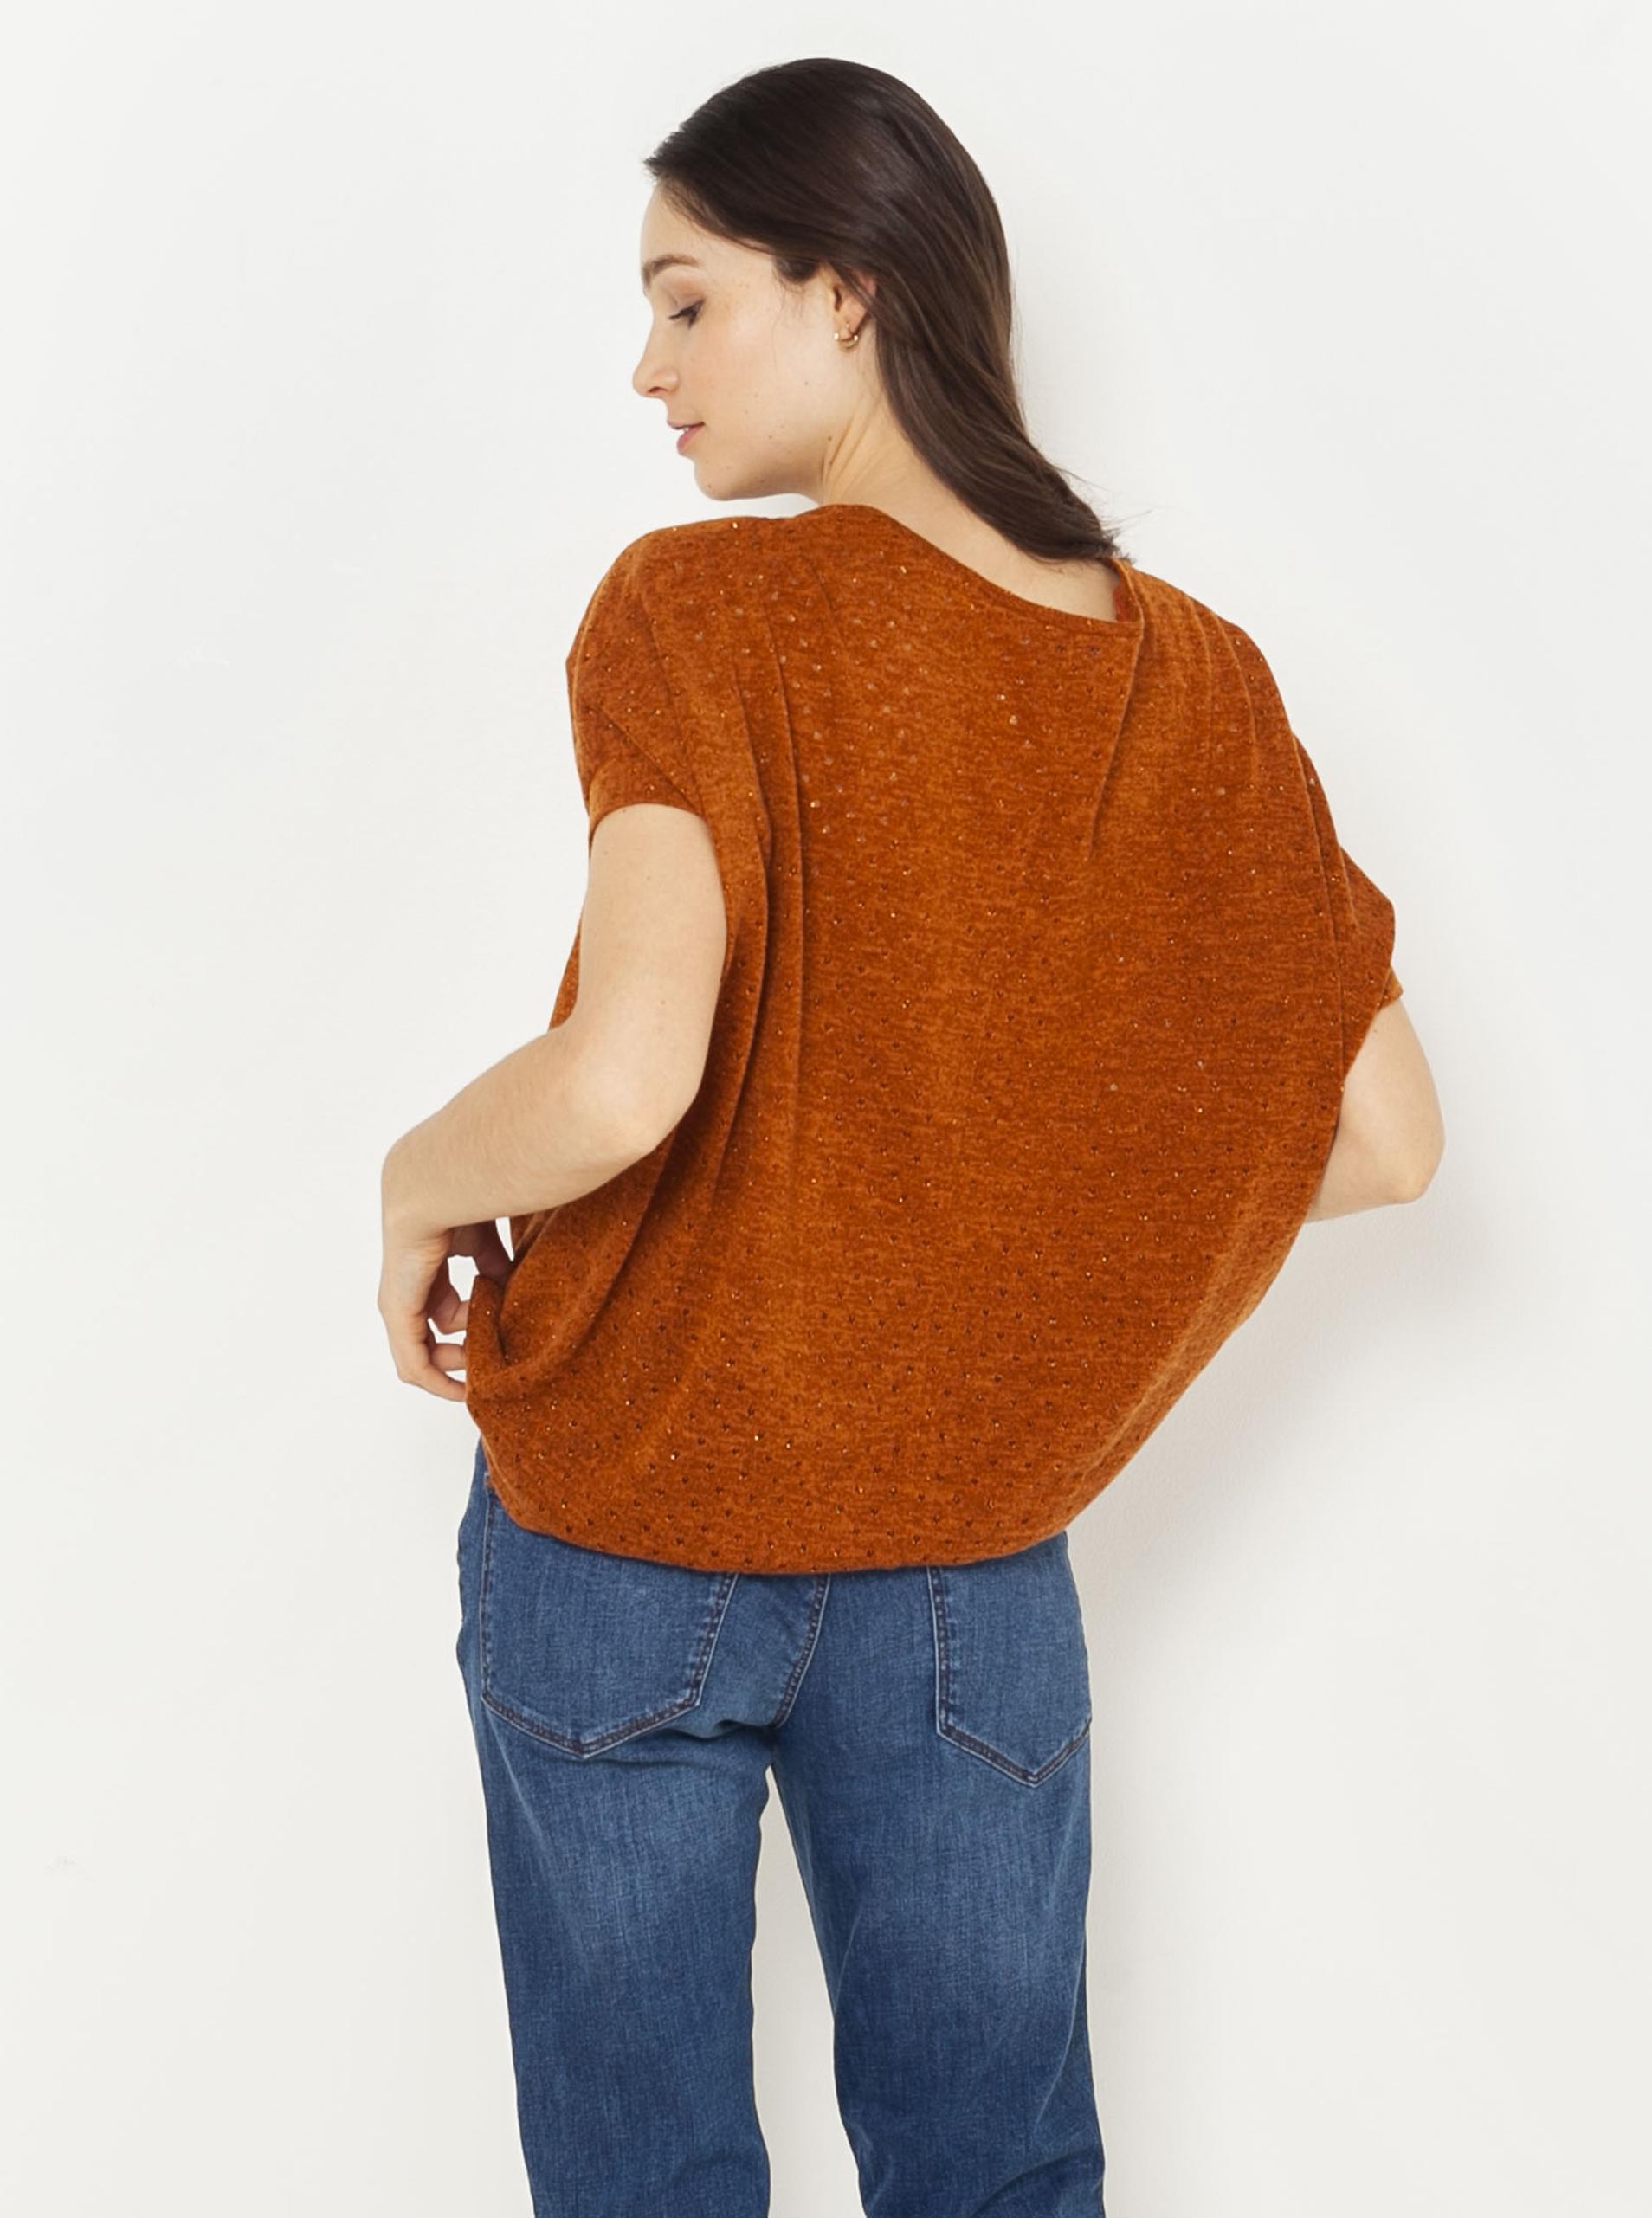 CAMAIEU brązowy koszulka